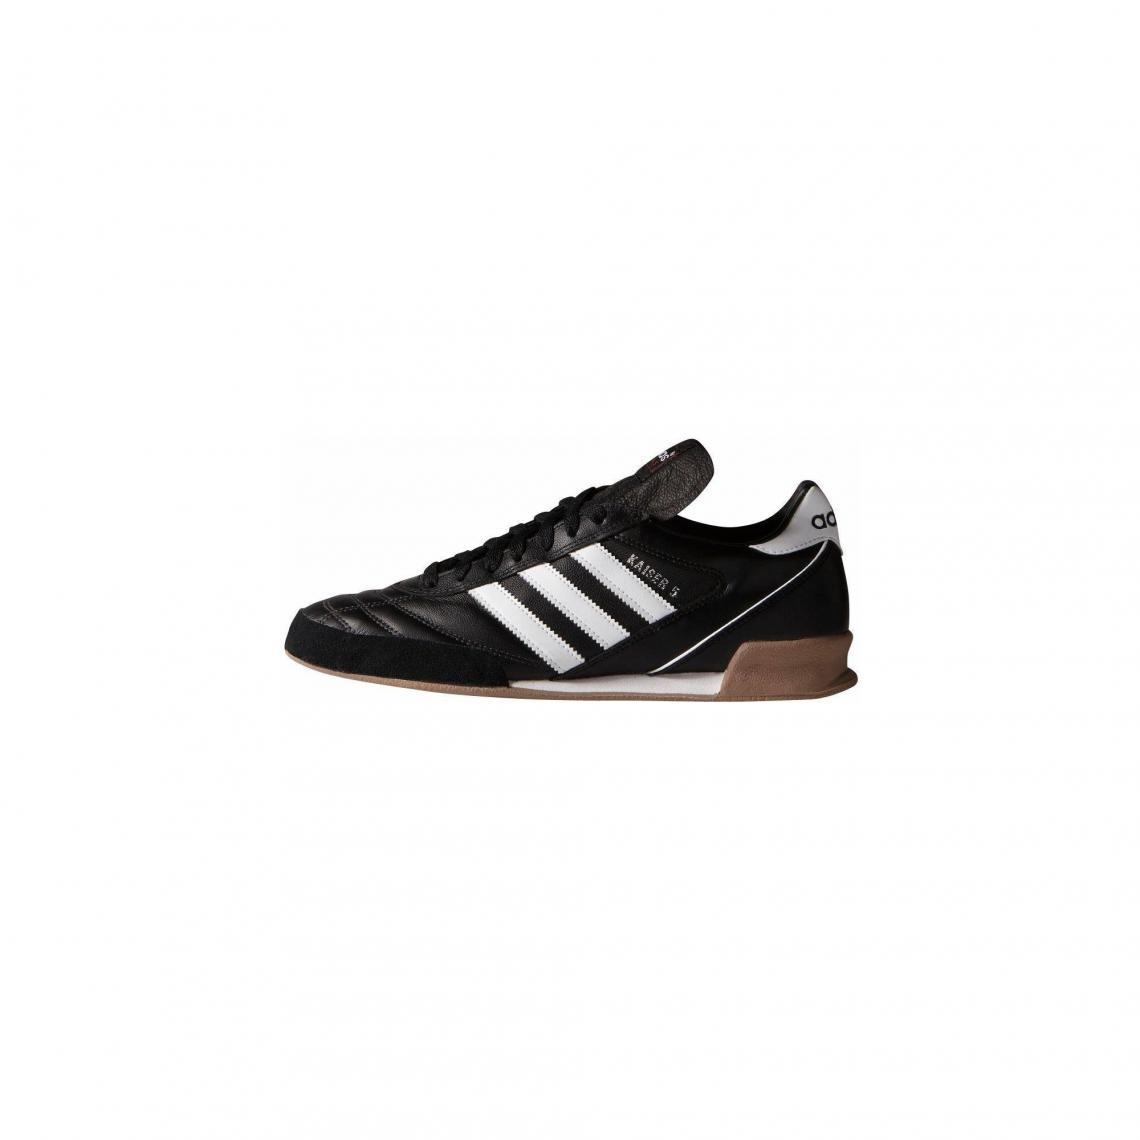 newest b3c3e 00c0b Chaussures de football en salle homme adidas Performance Kaiser 5 Goal -  Noir - Blanc Adidas